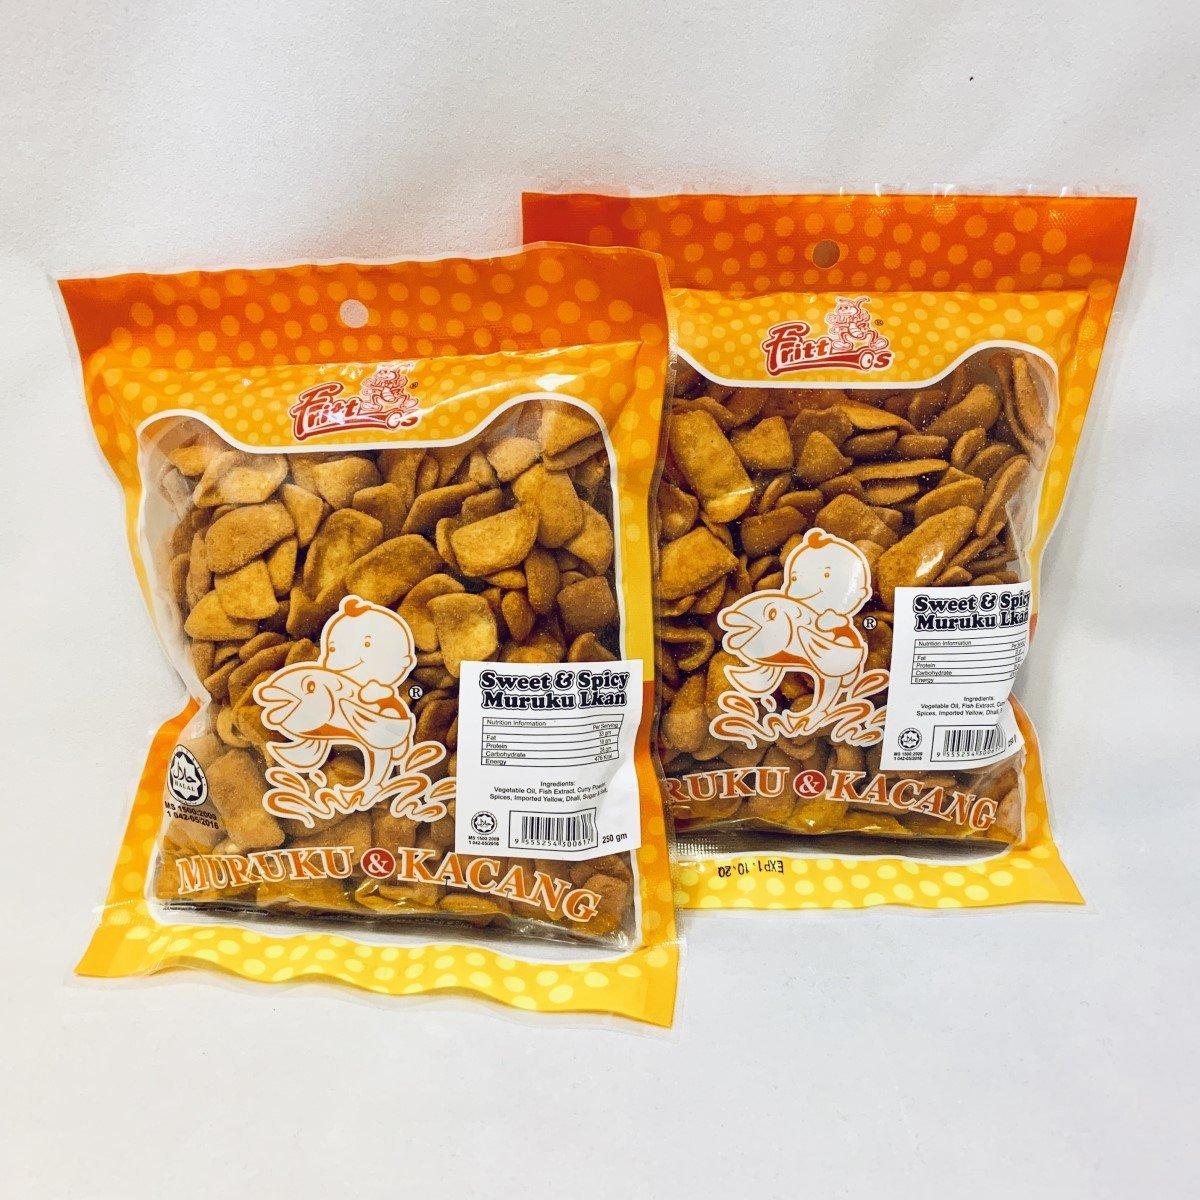 Malaysian fish cracker small chips (Sweet & Spicy) 【2 pcs】